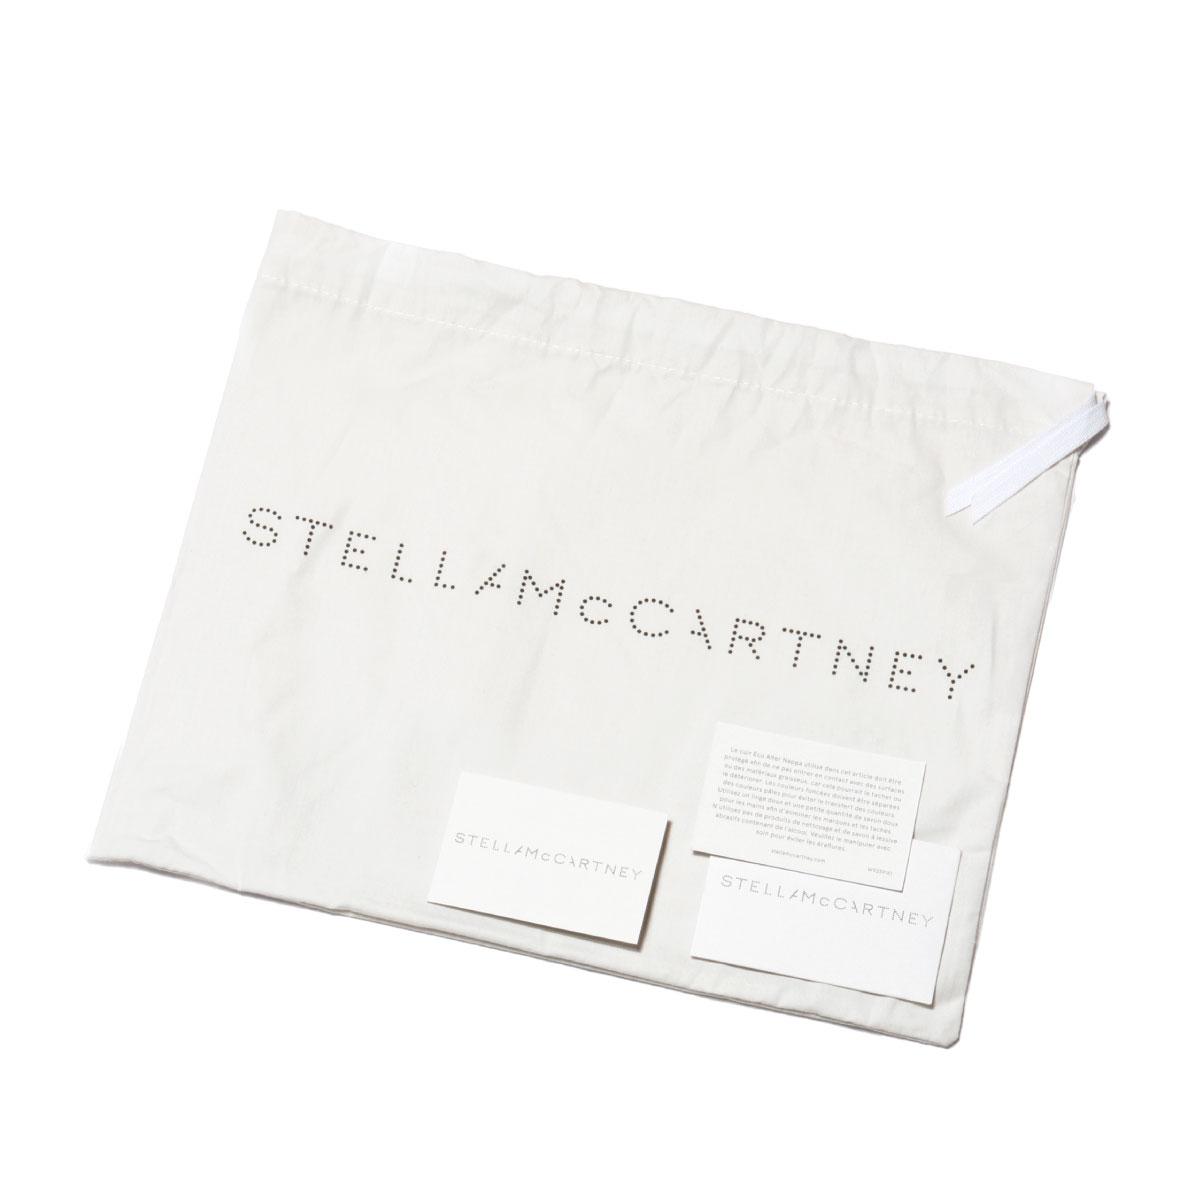 STELLA McCARTNEY ステラ マッカートニー | ショルダーバッグ ミニ | FALABELLA ファラベラ